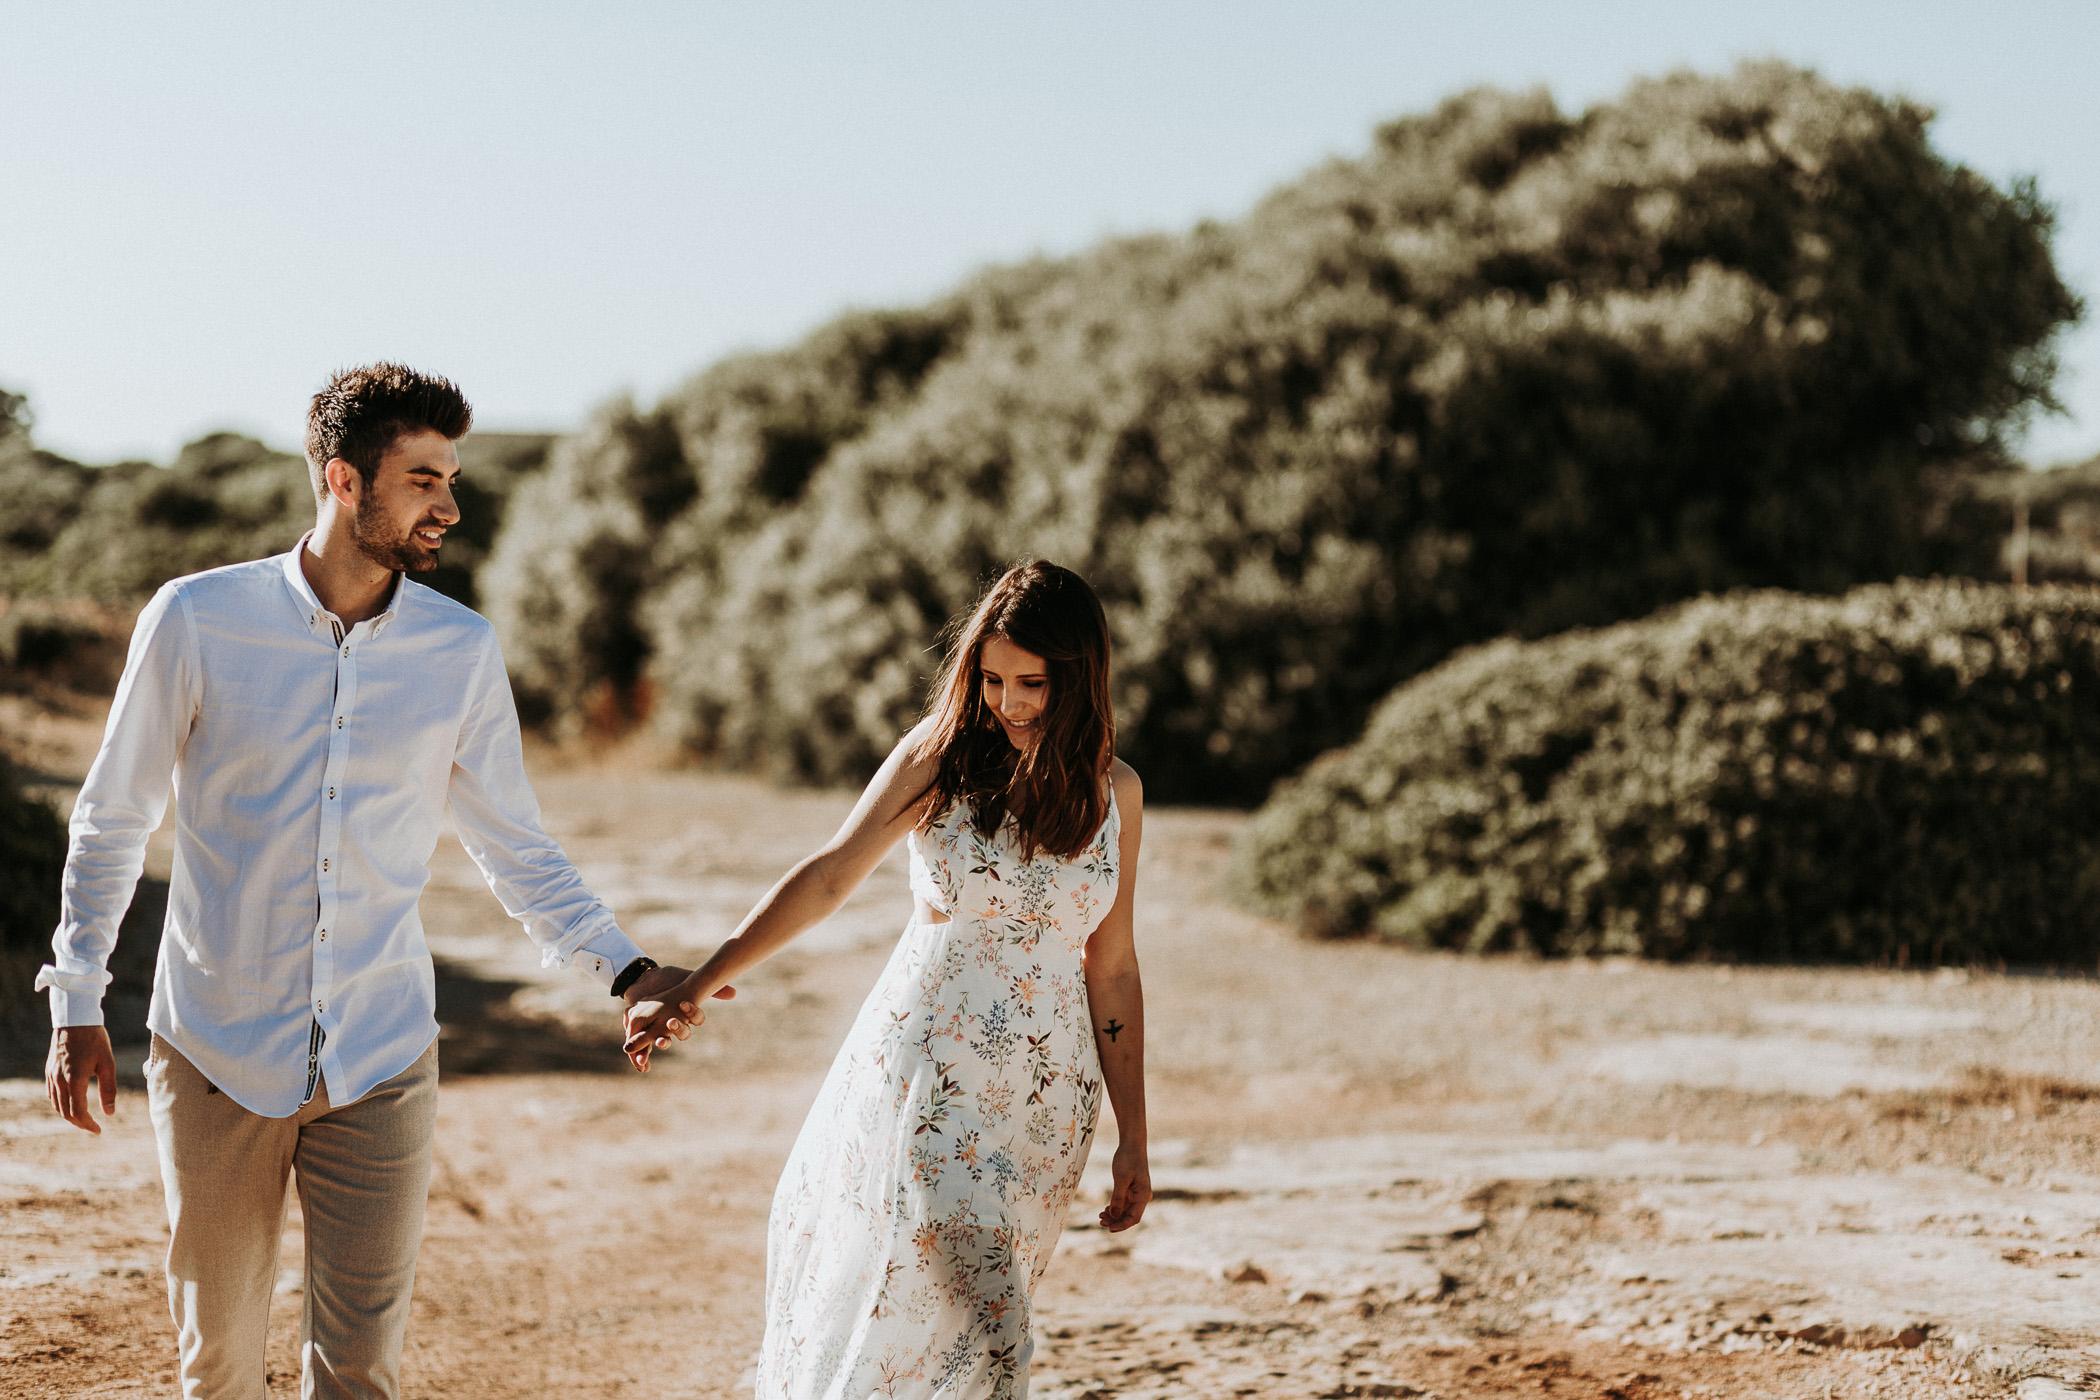 DanielaMarquardtPhotography_wedding_elopement_mallorca_spain_calapi_palma_lauraandtoni_161